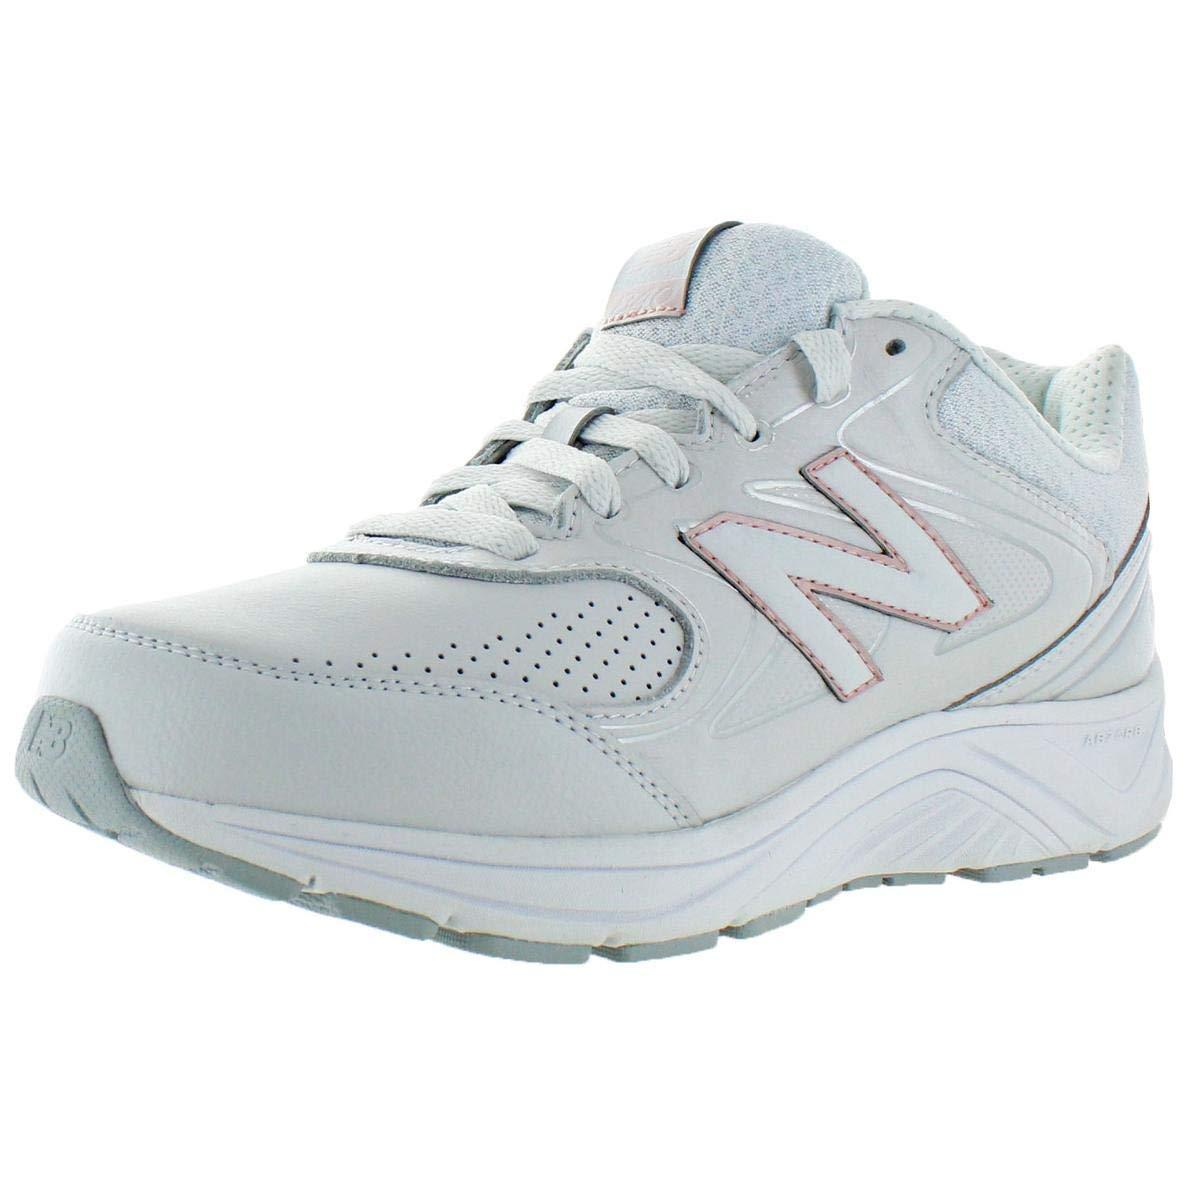 gris Rose or 38.5 2E EU nouveau   840, Chaussures Multisport Indoor Femme